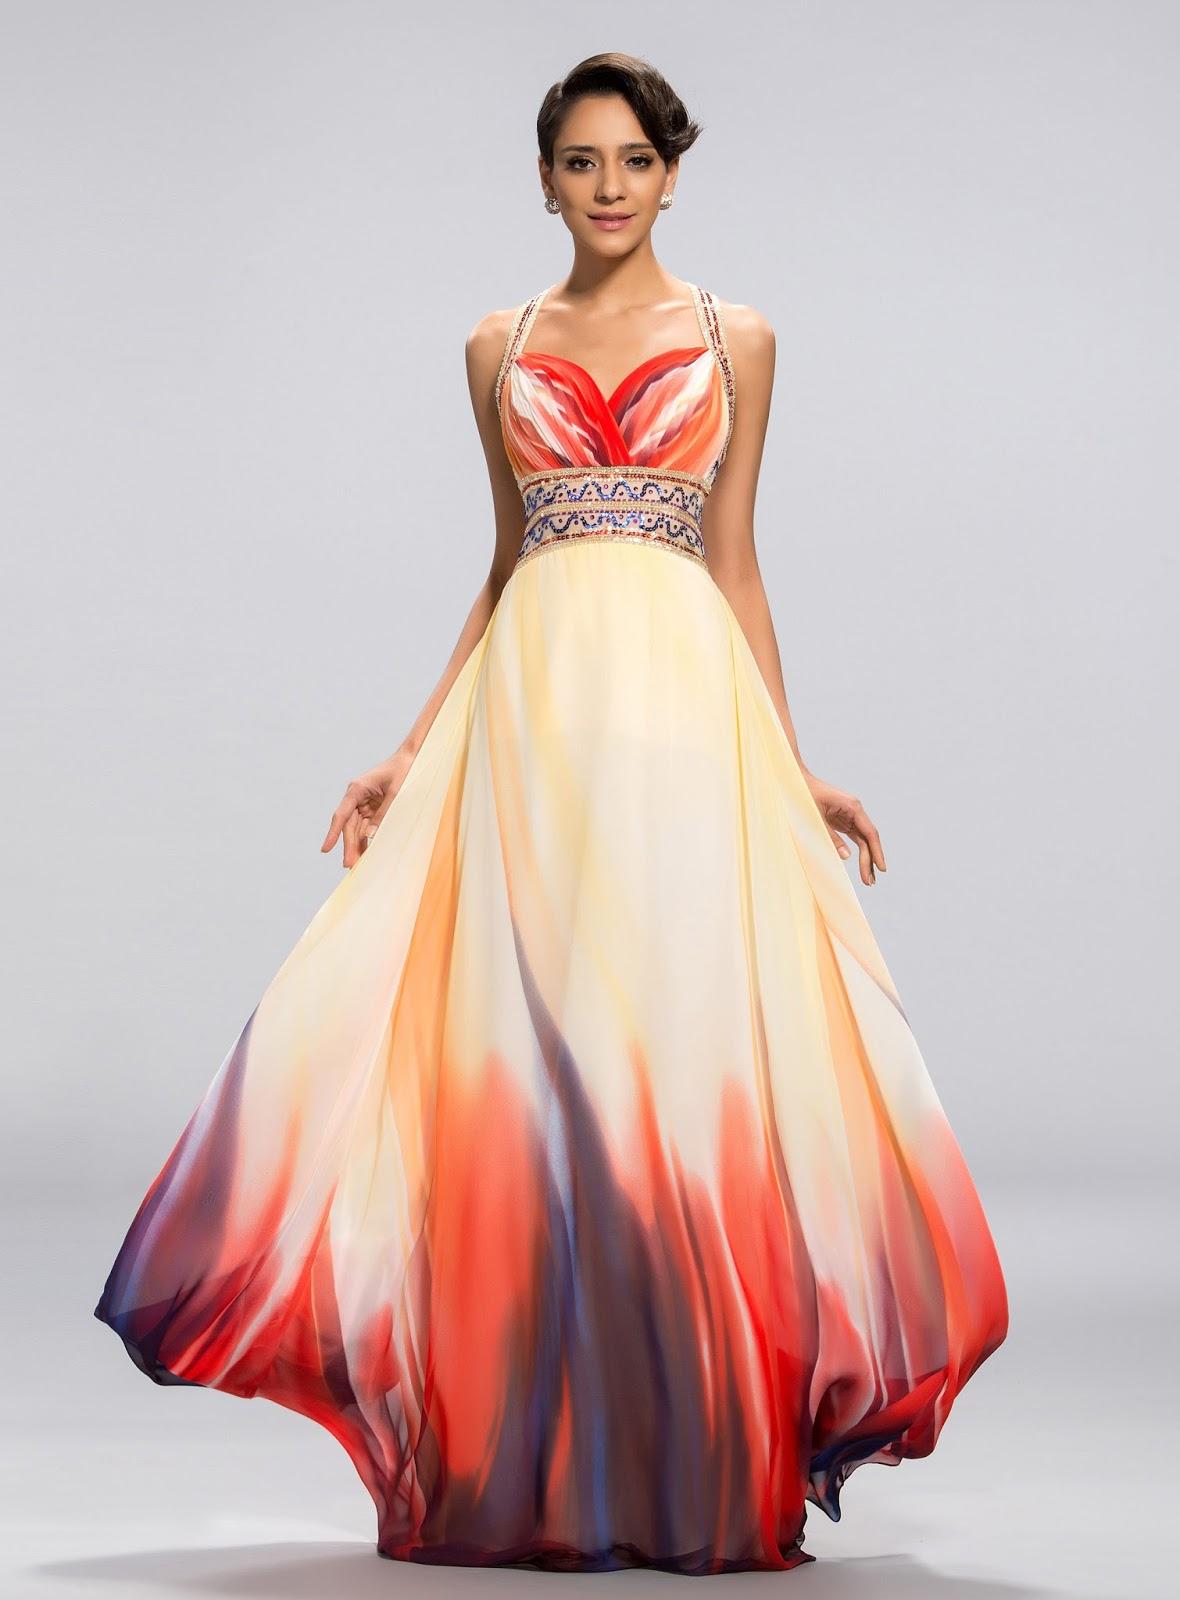 Prom dress choosing tips fashion eggplant prom dress choosing tips ombrellifo Choice Image